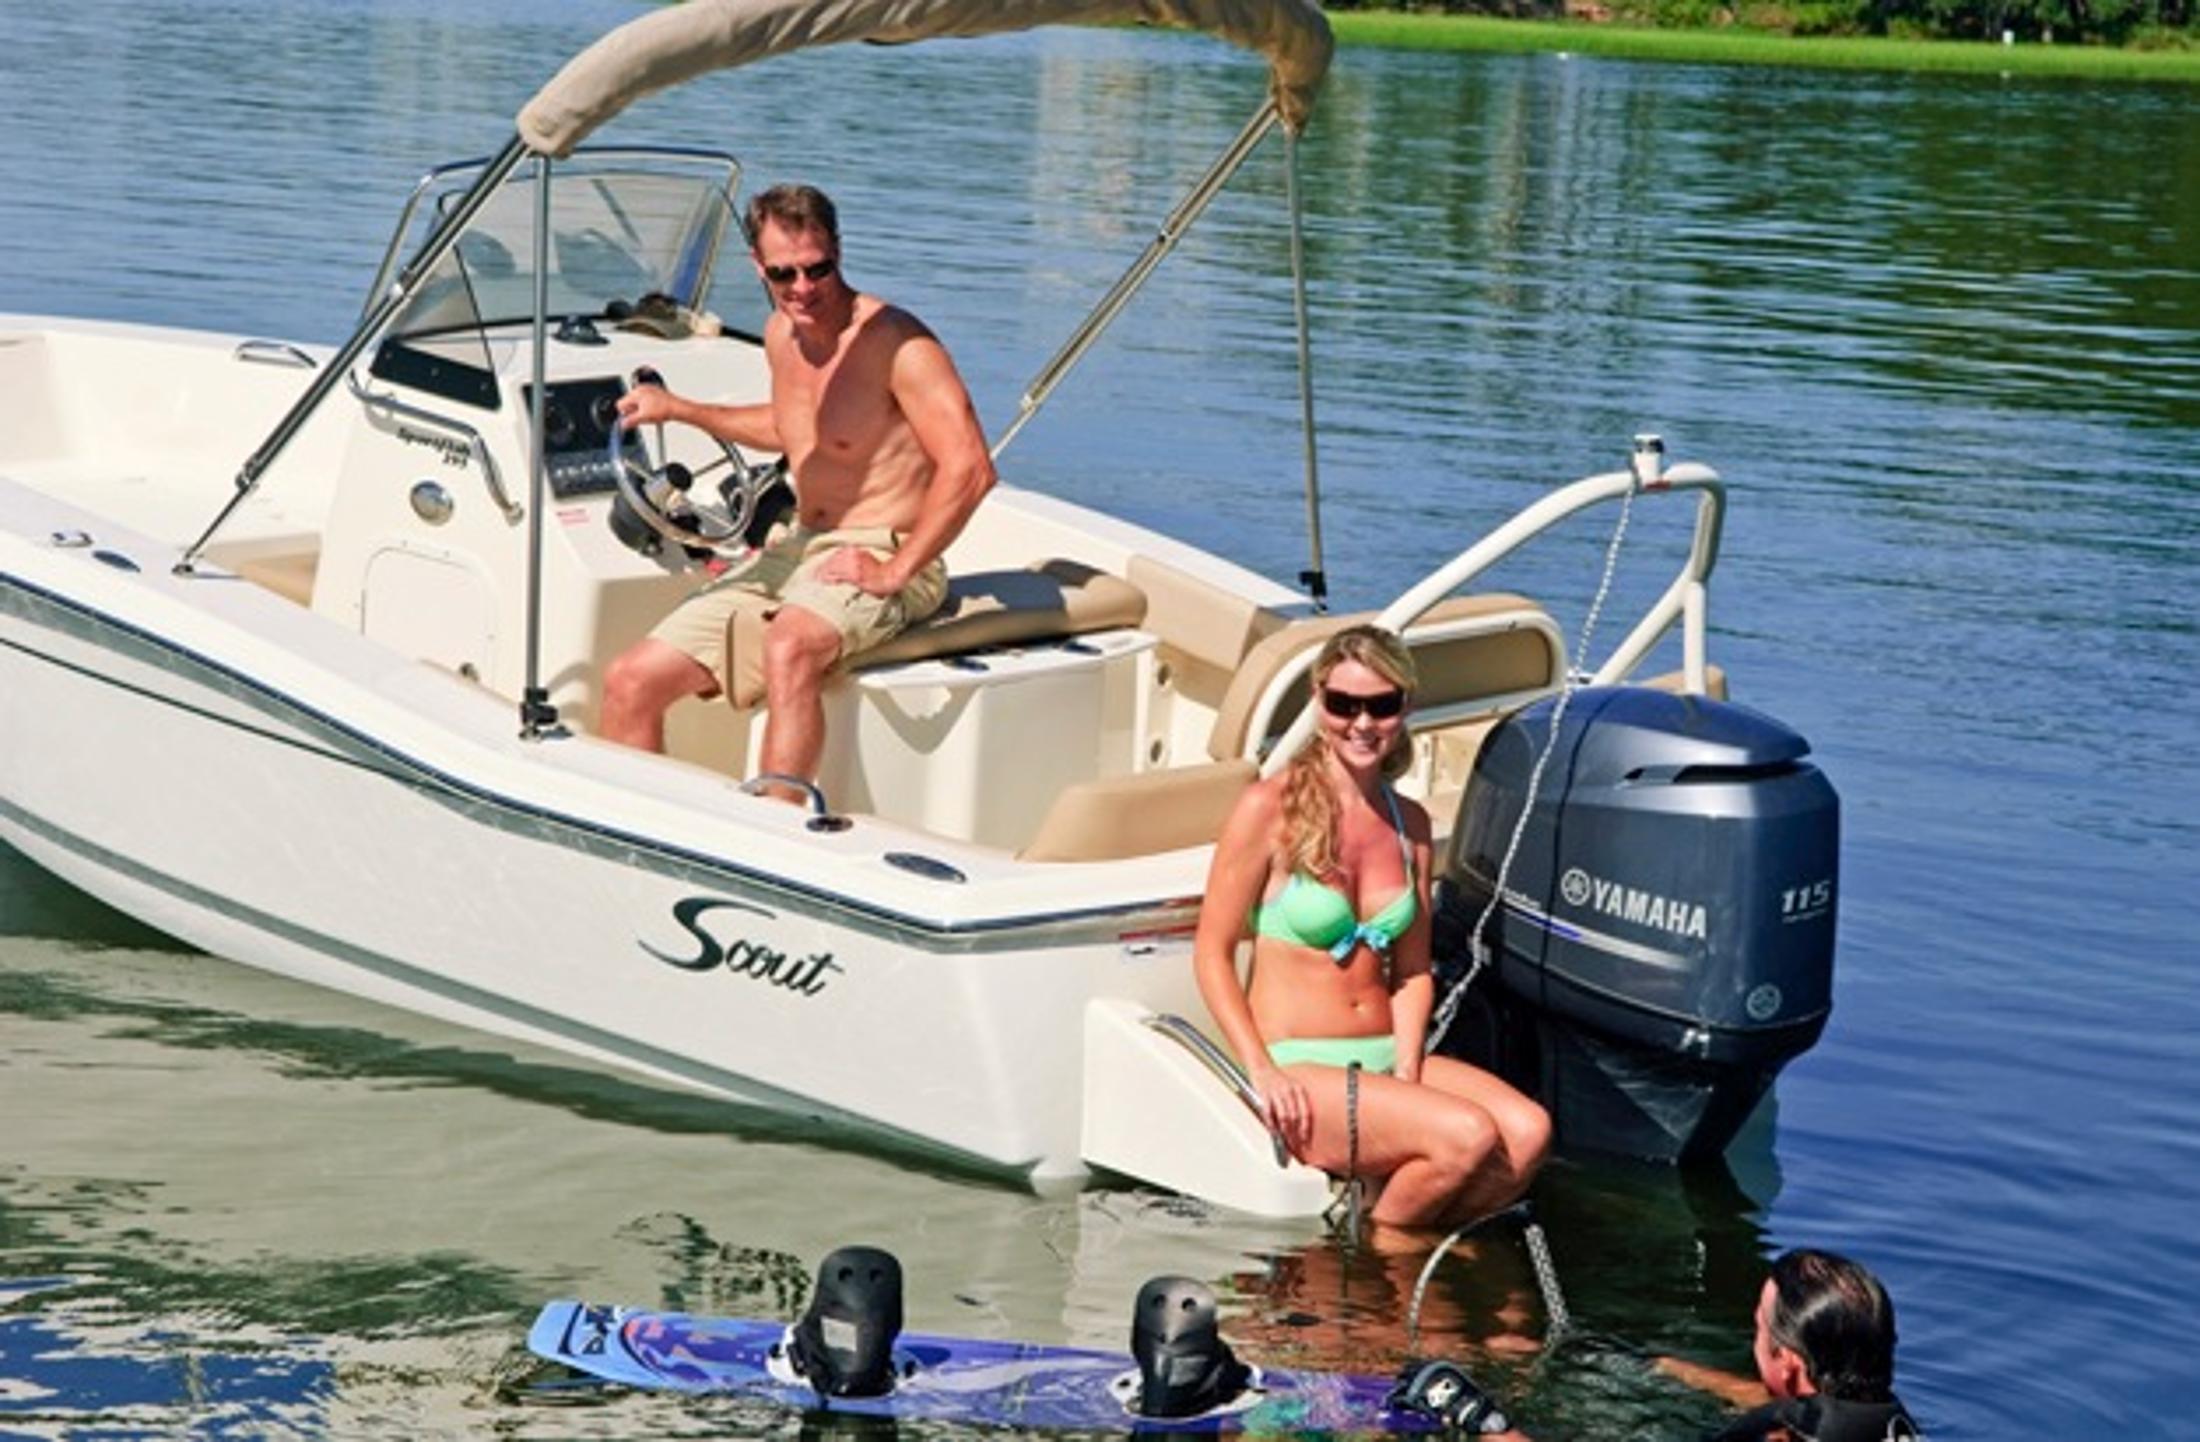 Scout Boats195 Sportfish